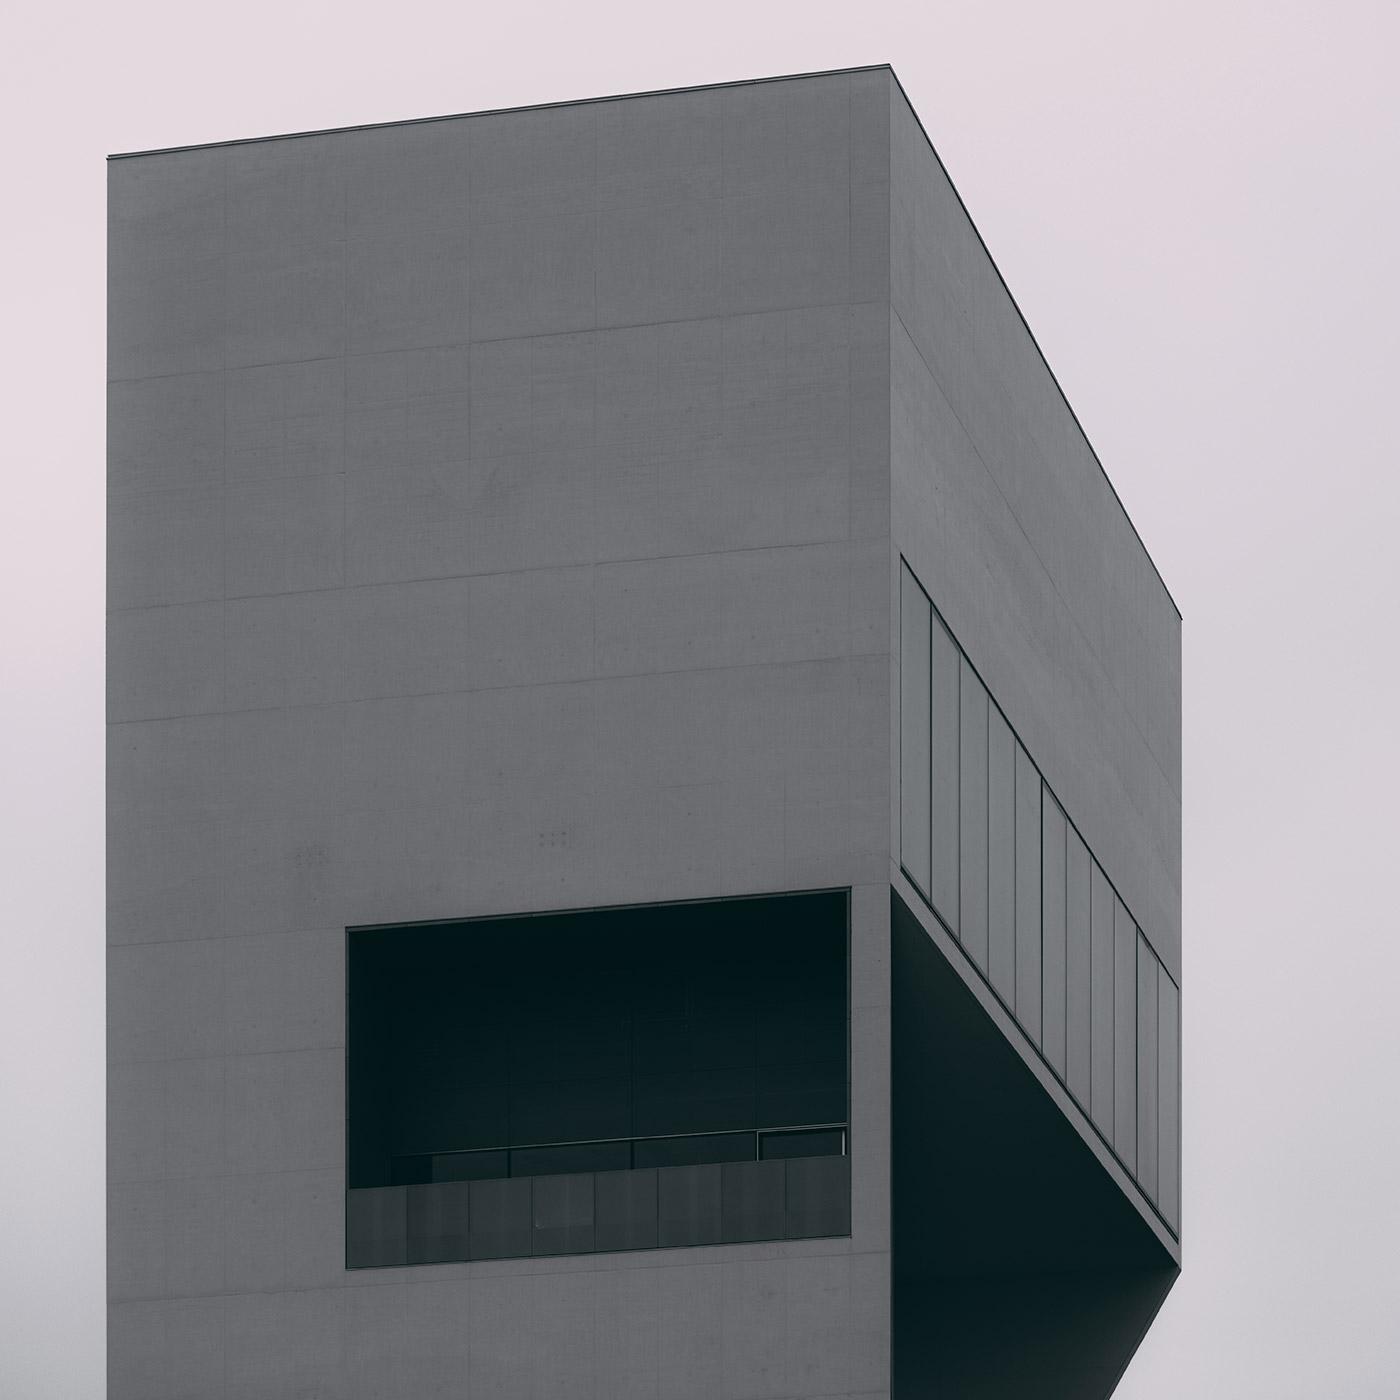 Fondazione Prada <br />Location: Milan, Italy <br />Architect: OMA